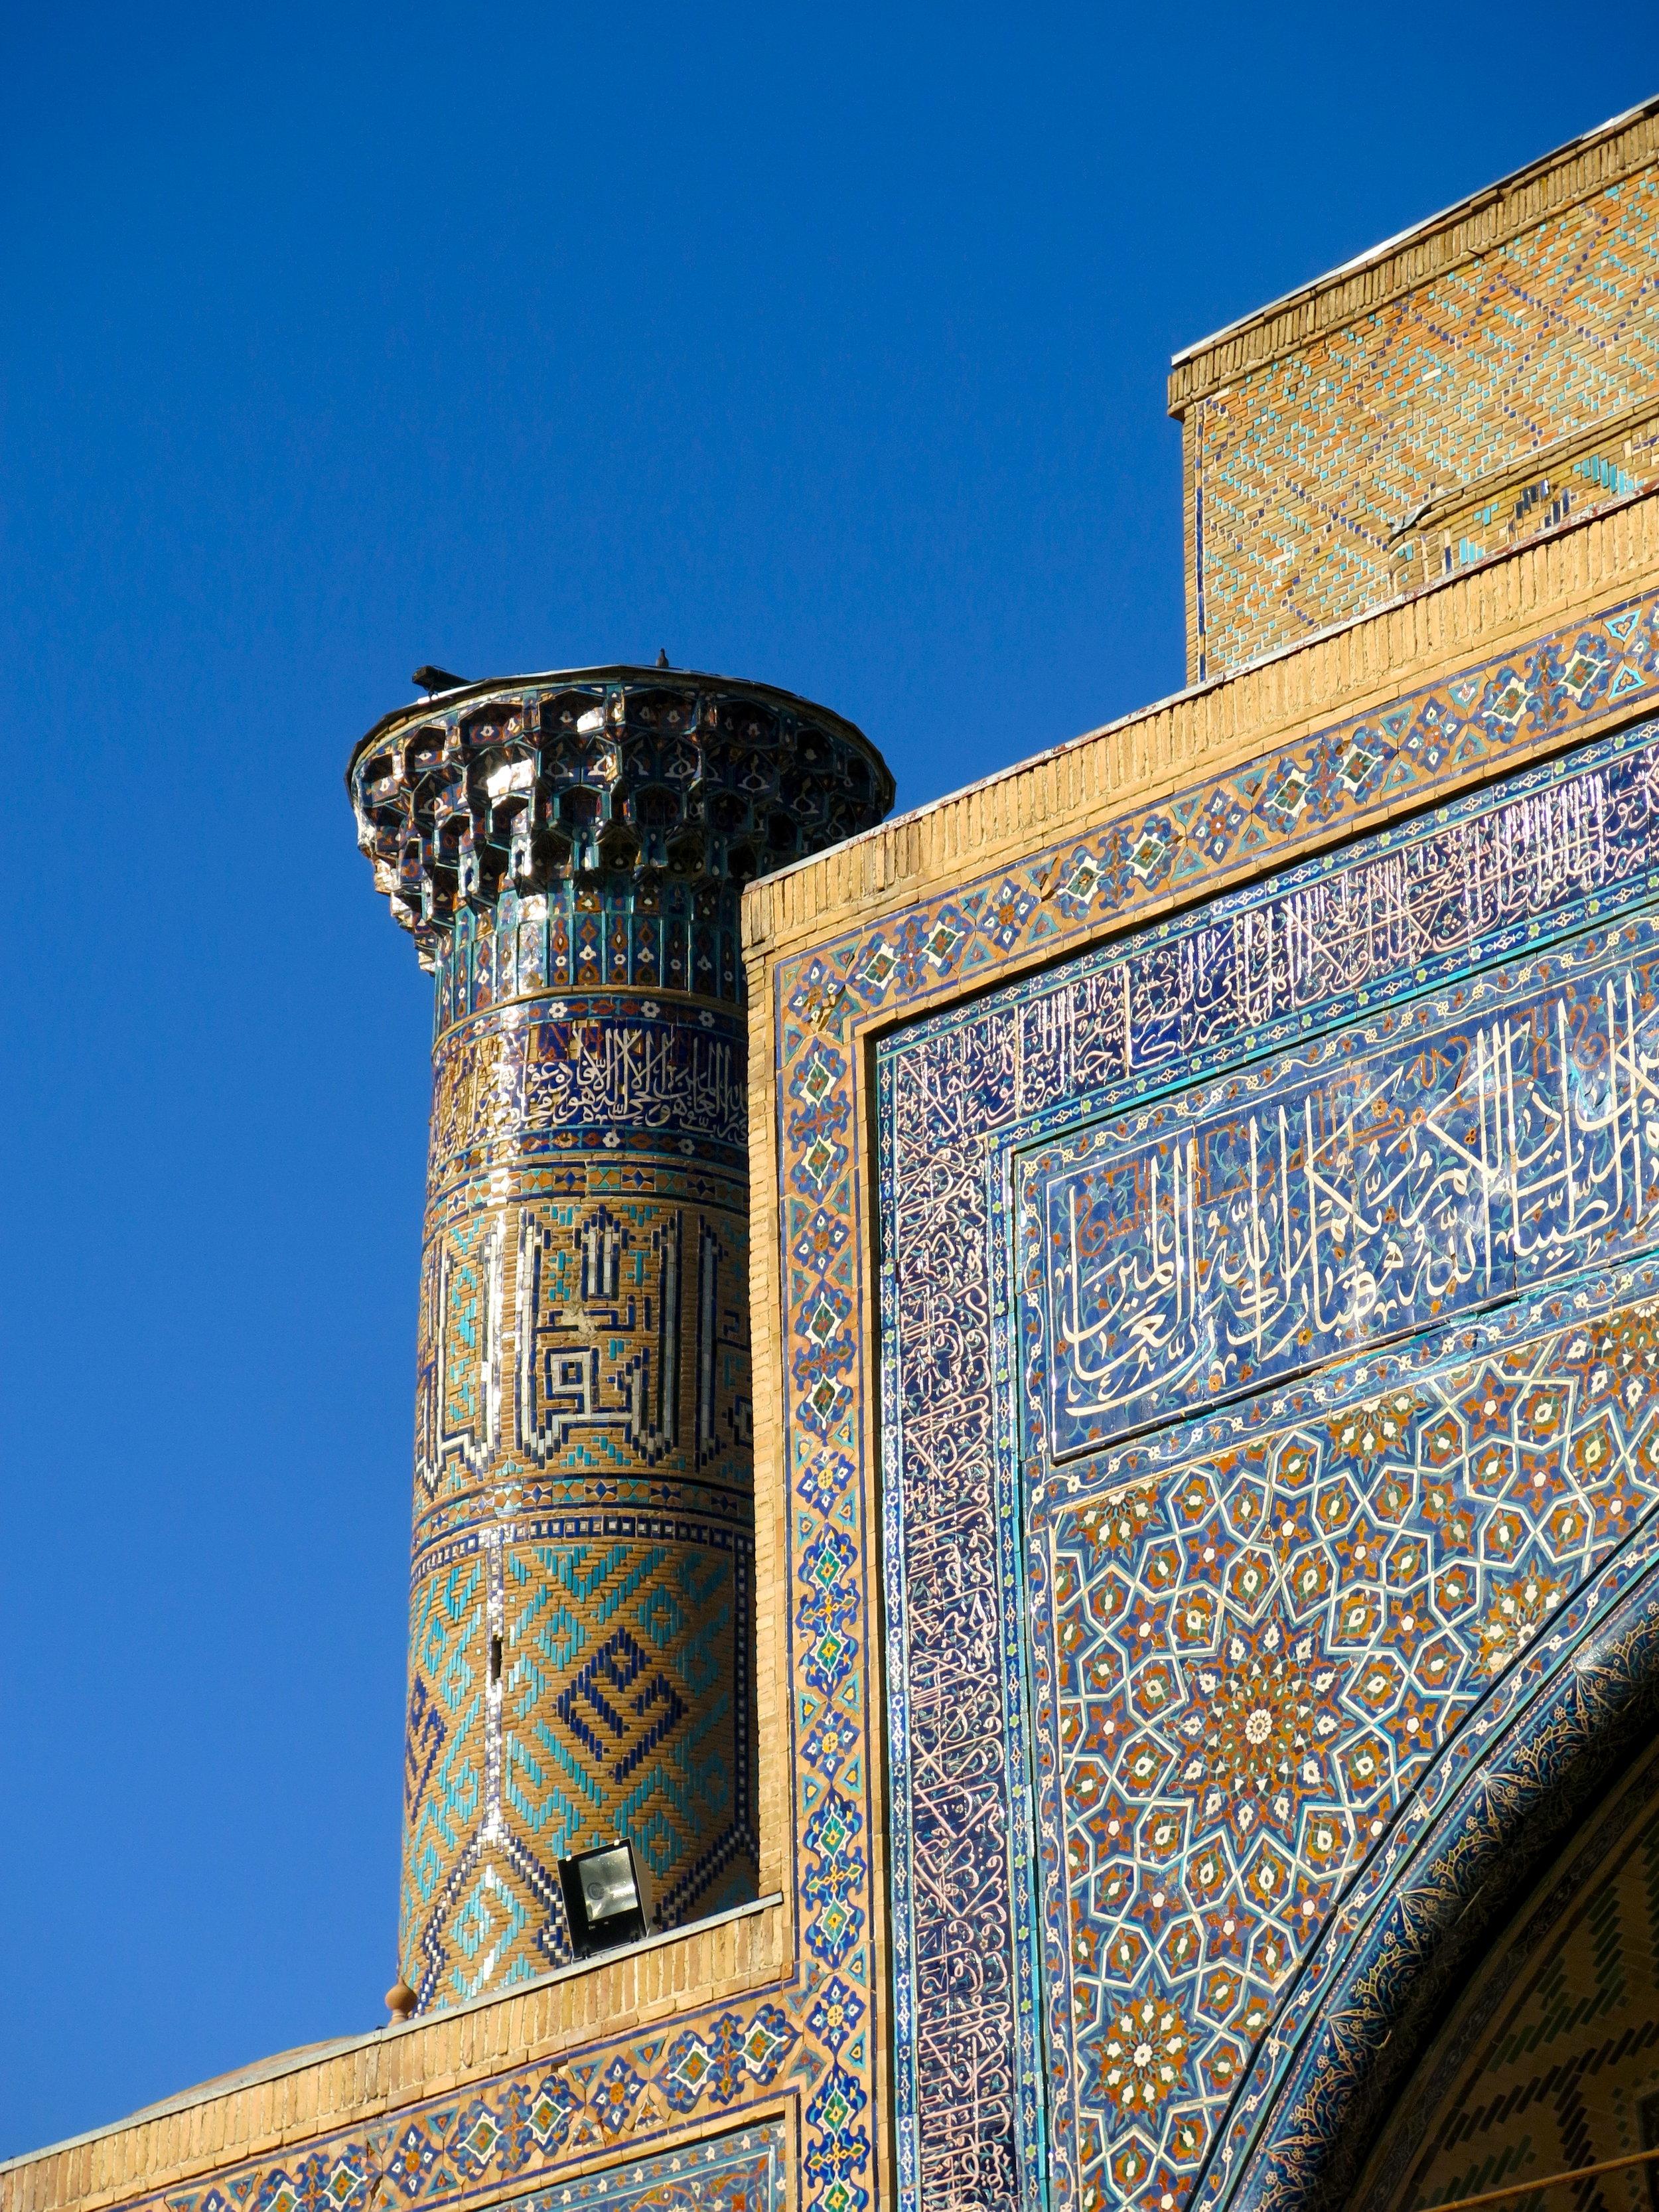 Islamic calligraphy on the Iwan (portal) of the madrasa